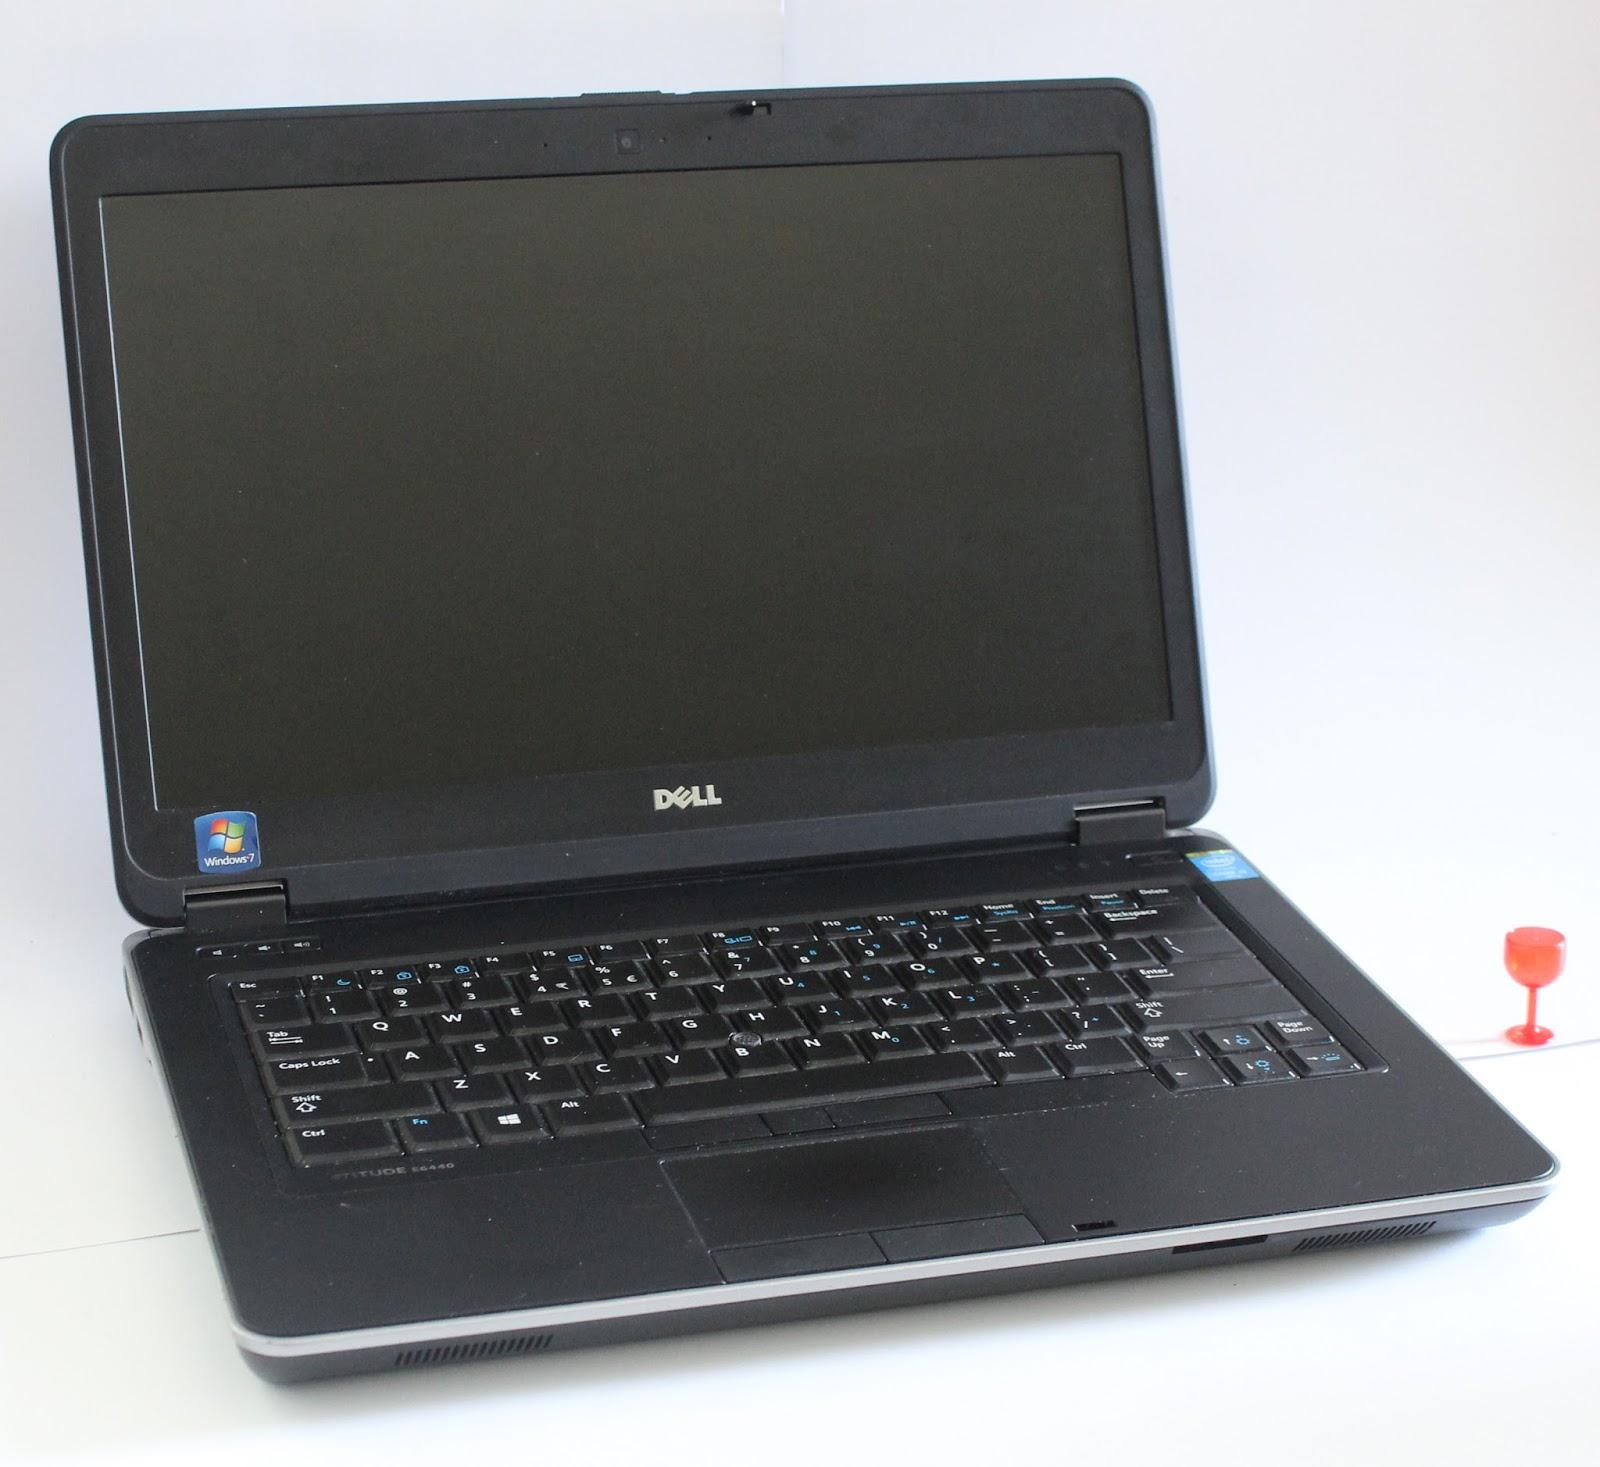 Jual Laptop Second Dell Latitude E6440 Core I5 Haswell Jual Beli Laptop Bekas Kamera Service Sparepart Di Malang